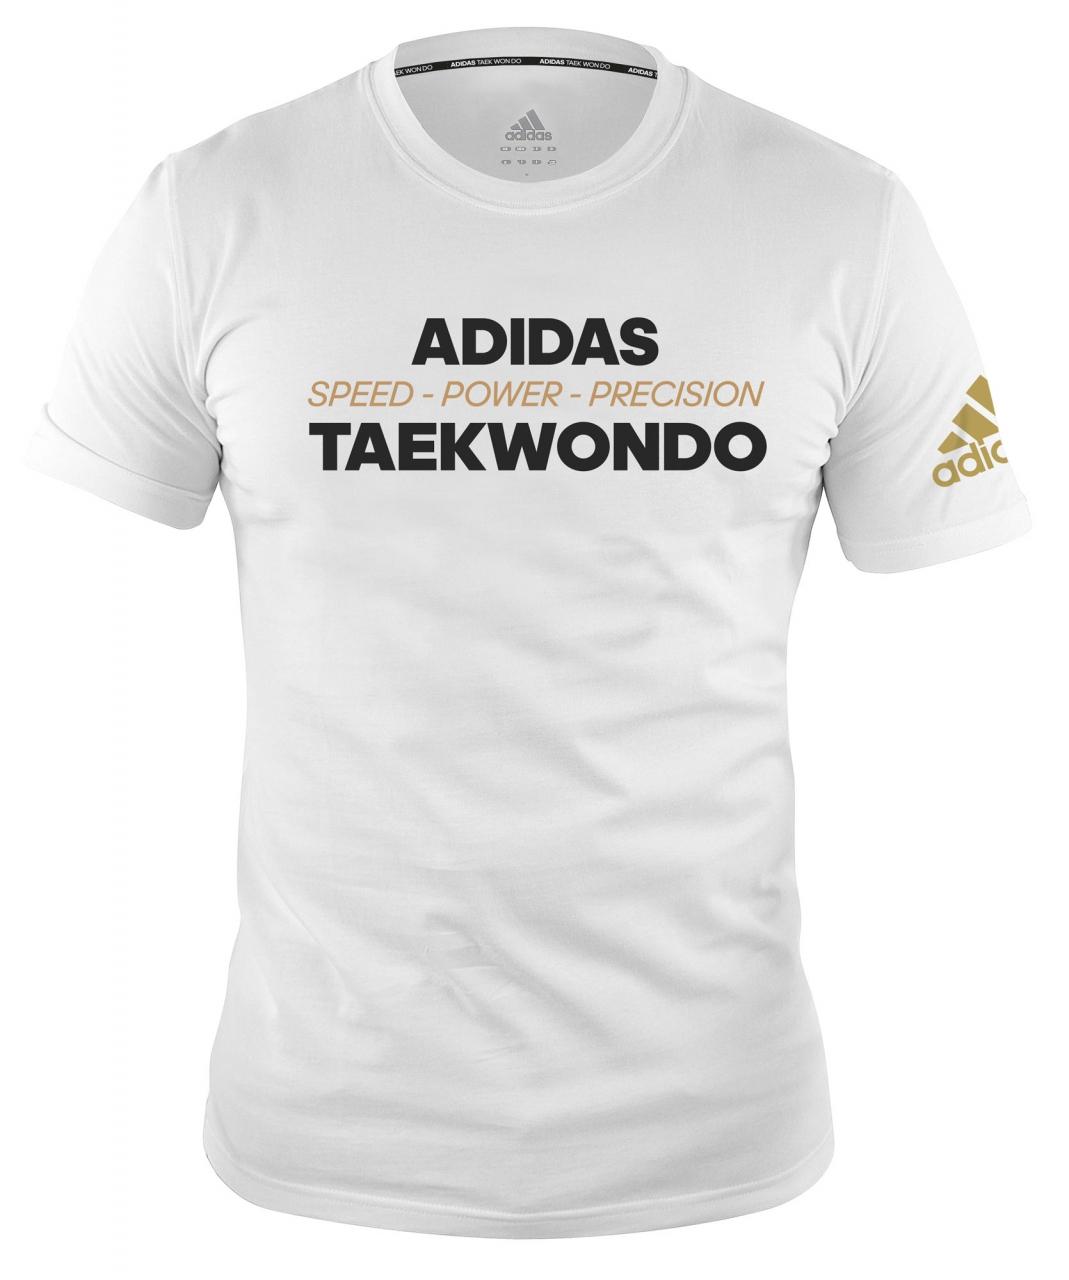 adidas Community line T Shirt Taekwondo Power white, adiTCL02